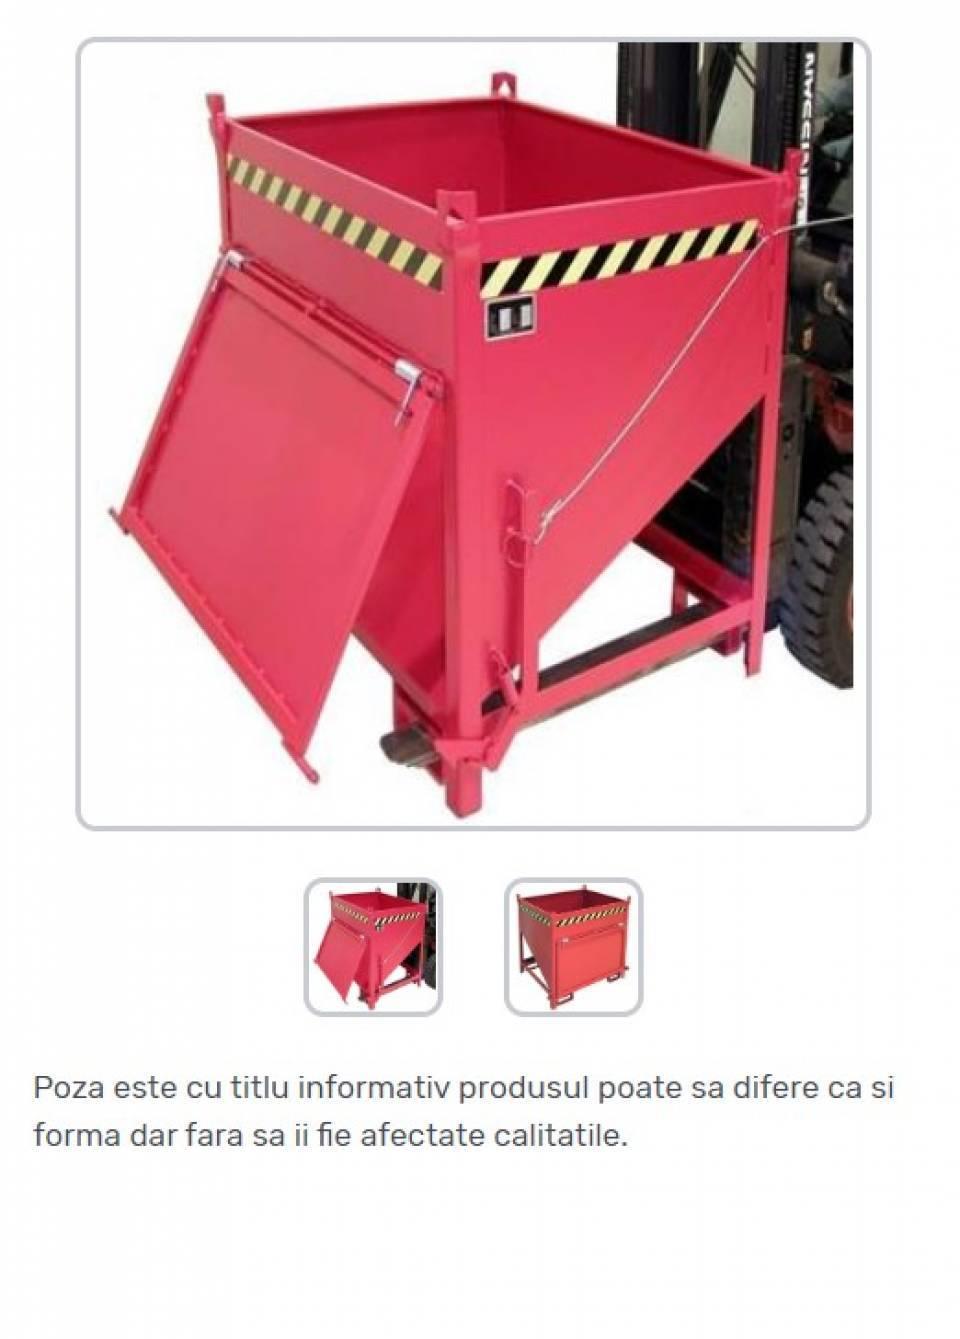 Container cu descarcare gravitationala42184